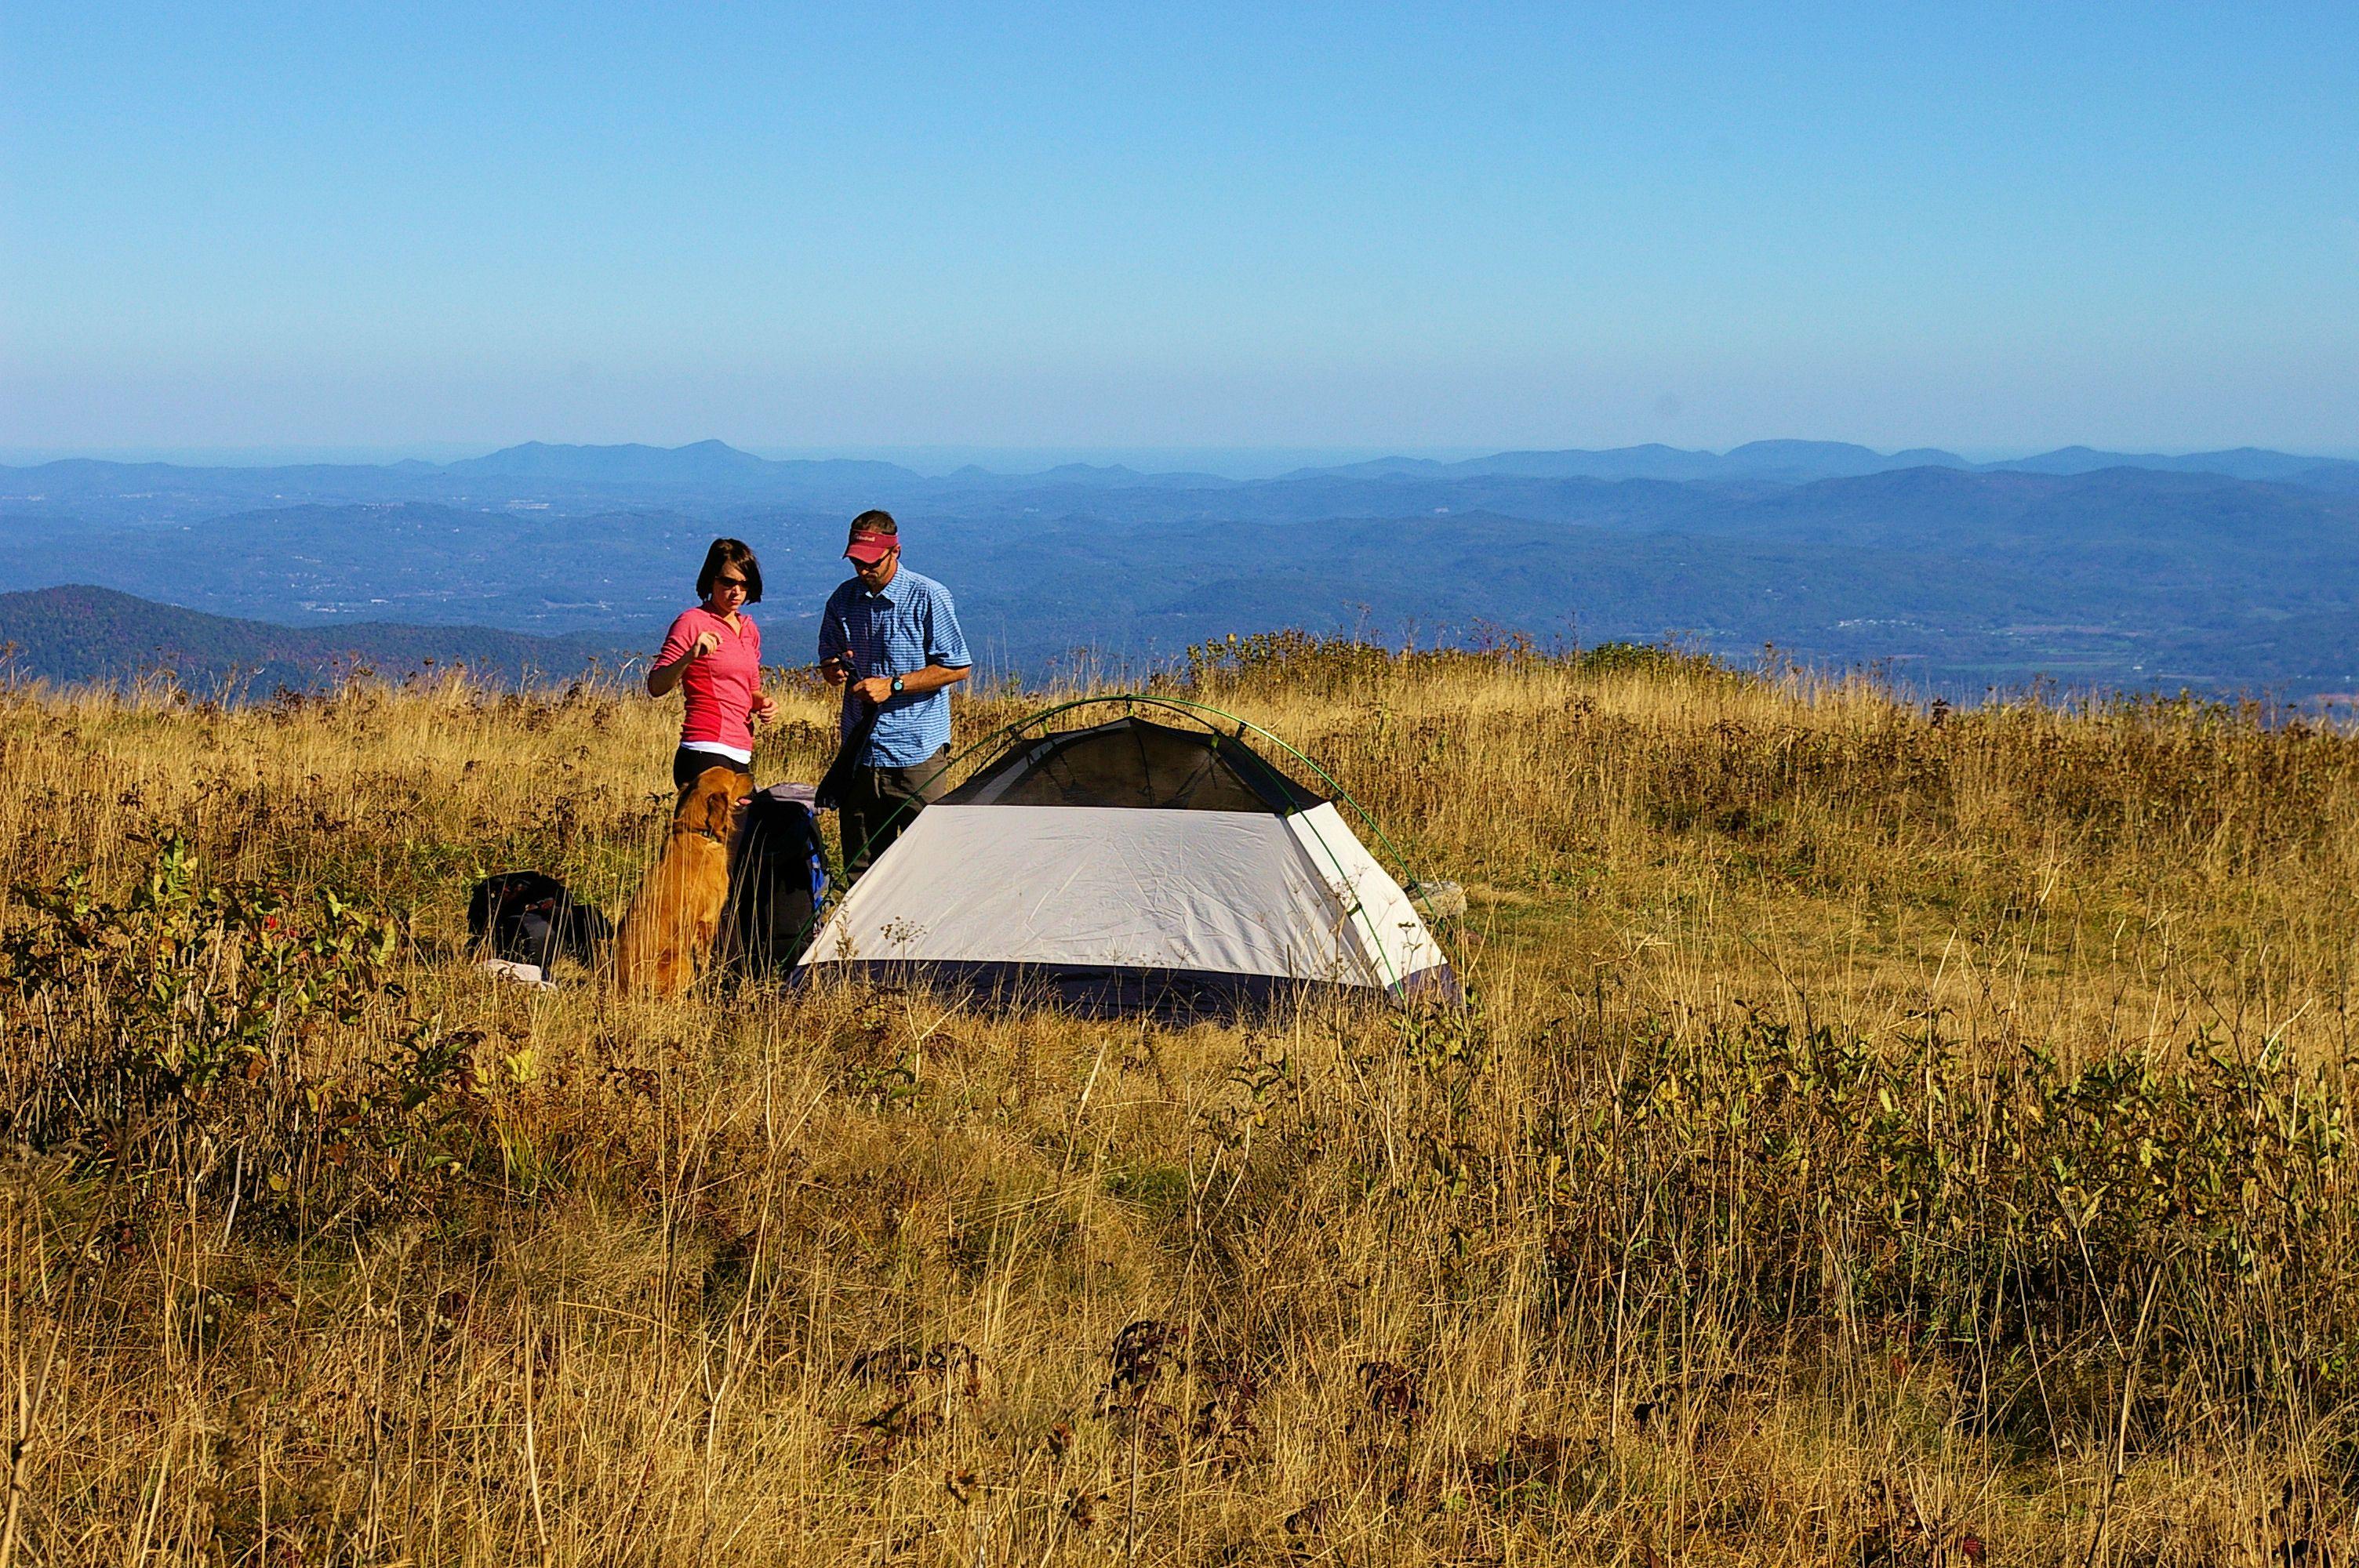 Pin On Blue Ridge Mountains Of North Carolina